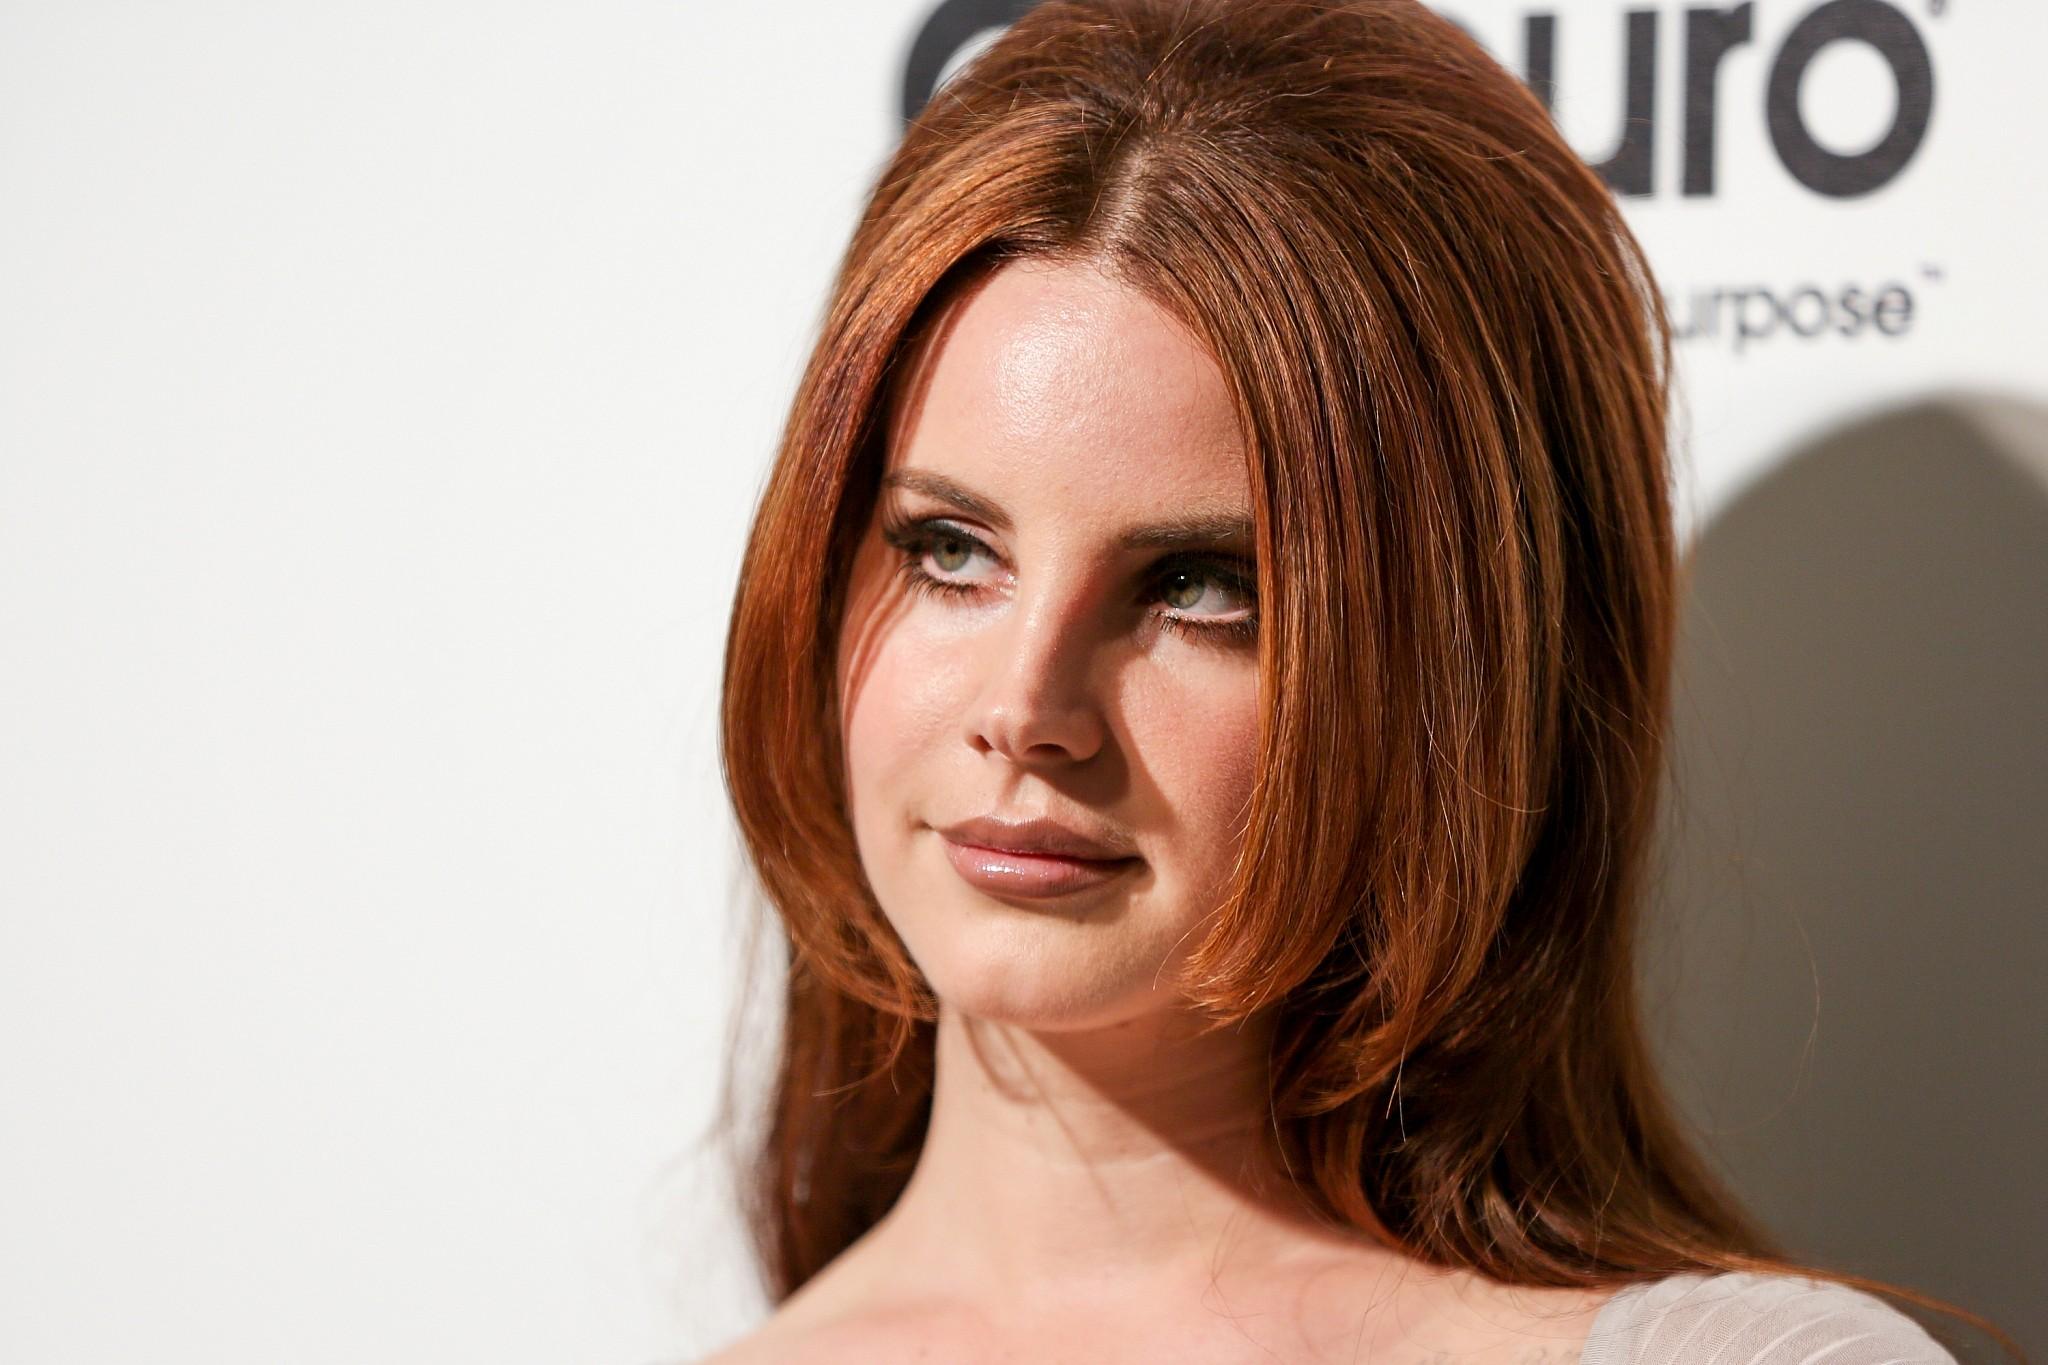 Lana Del Rey Responds To Criticism Of Her Israeli Show